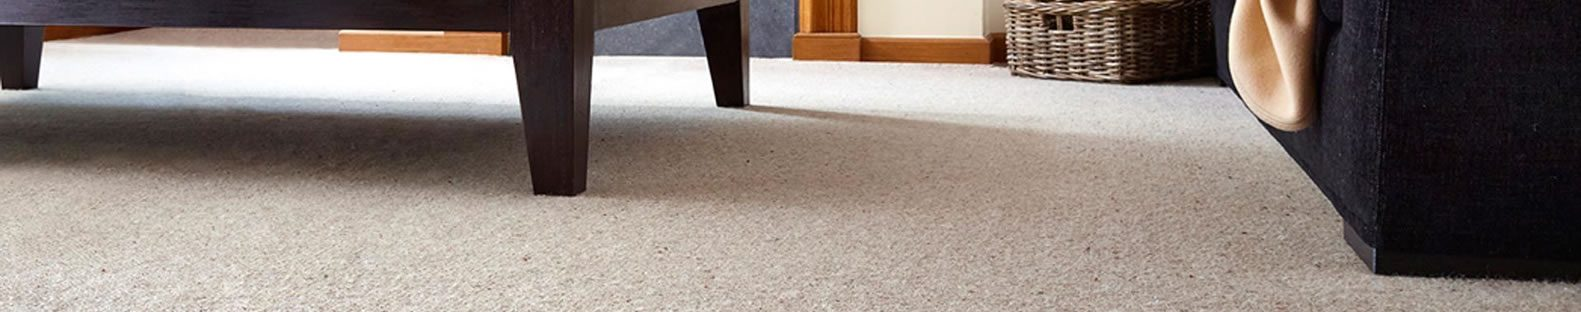 new Carpet dunston